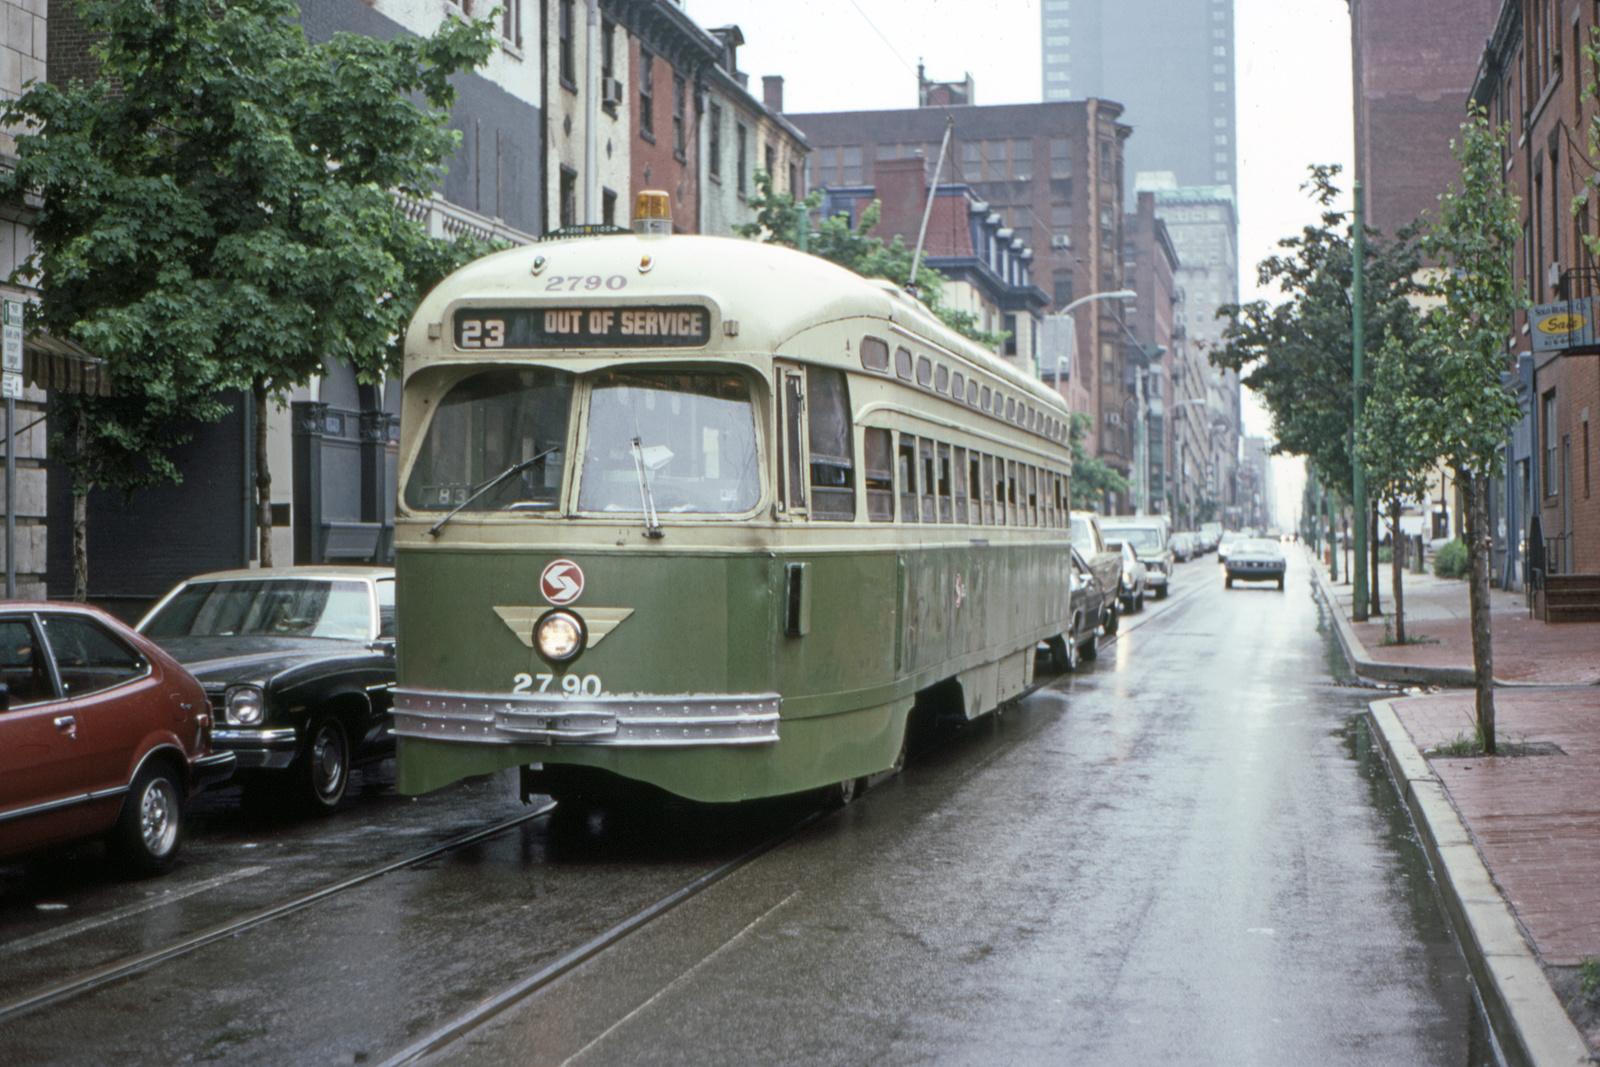 (752k, 1600x1067)<br><b>Country:</b> United States<br><b>City:</b> Philadelphia, PA<br><b>System:</b> SEPTA (or Predecessor)<br><b>Line:</b> Rt. 23-Germantown<br><b>Location:</b> 12th/Manning<br><b>Car:</b> PTC/SEPTA Postwar All-electric PCC (St.Louis, 1947) 2790 <br><b>Collection of:</b> David Pirmann<br><b>Date:</b> 5/22/1983<br><b>Viewed (this week/total):</b> 1 / 99